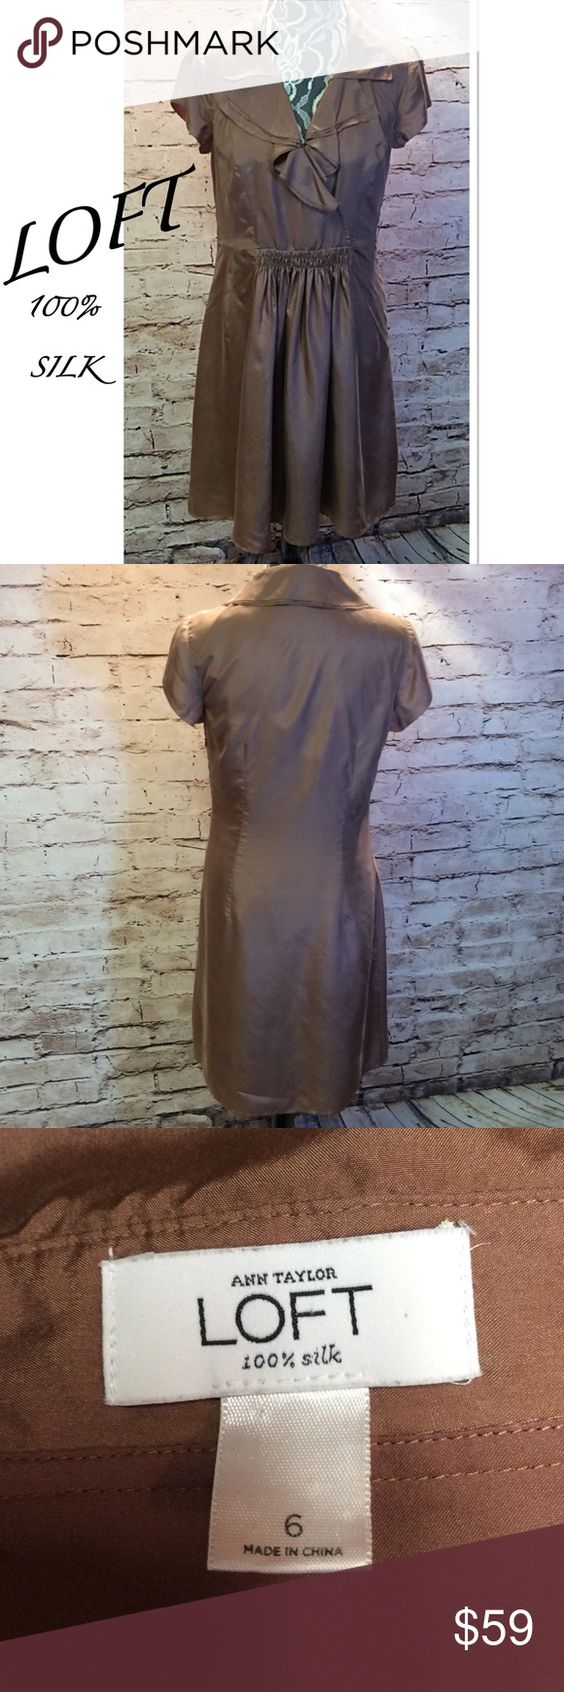 ANN TAYLOR LOFT DRESS Very classy dress in mocha. Pretty Ruffled neckline. Gently used LOFT Dresses